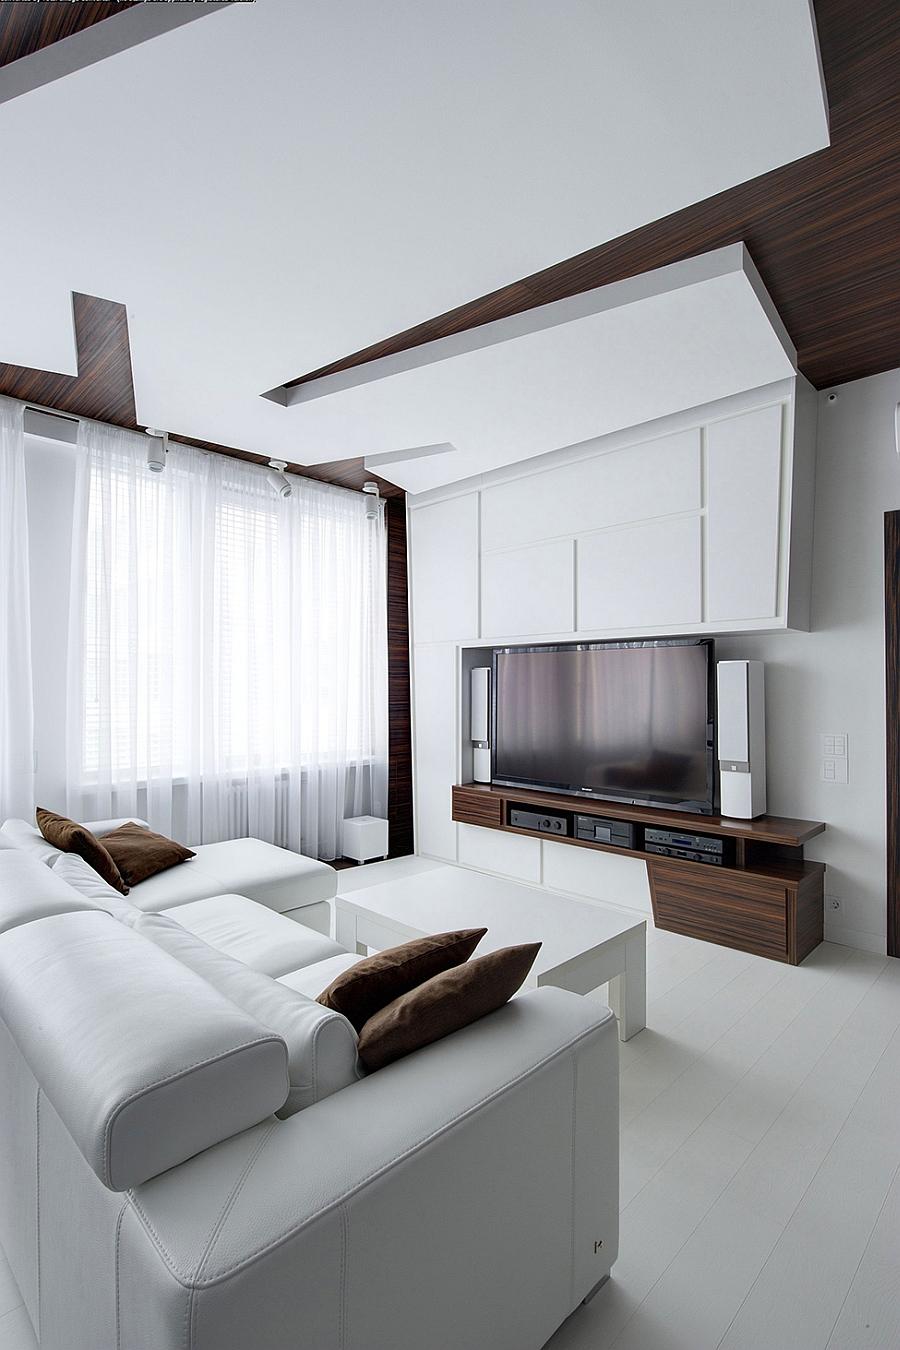 Compact living area with plush sofa